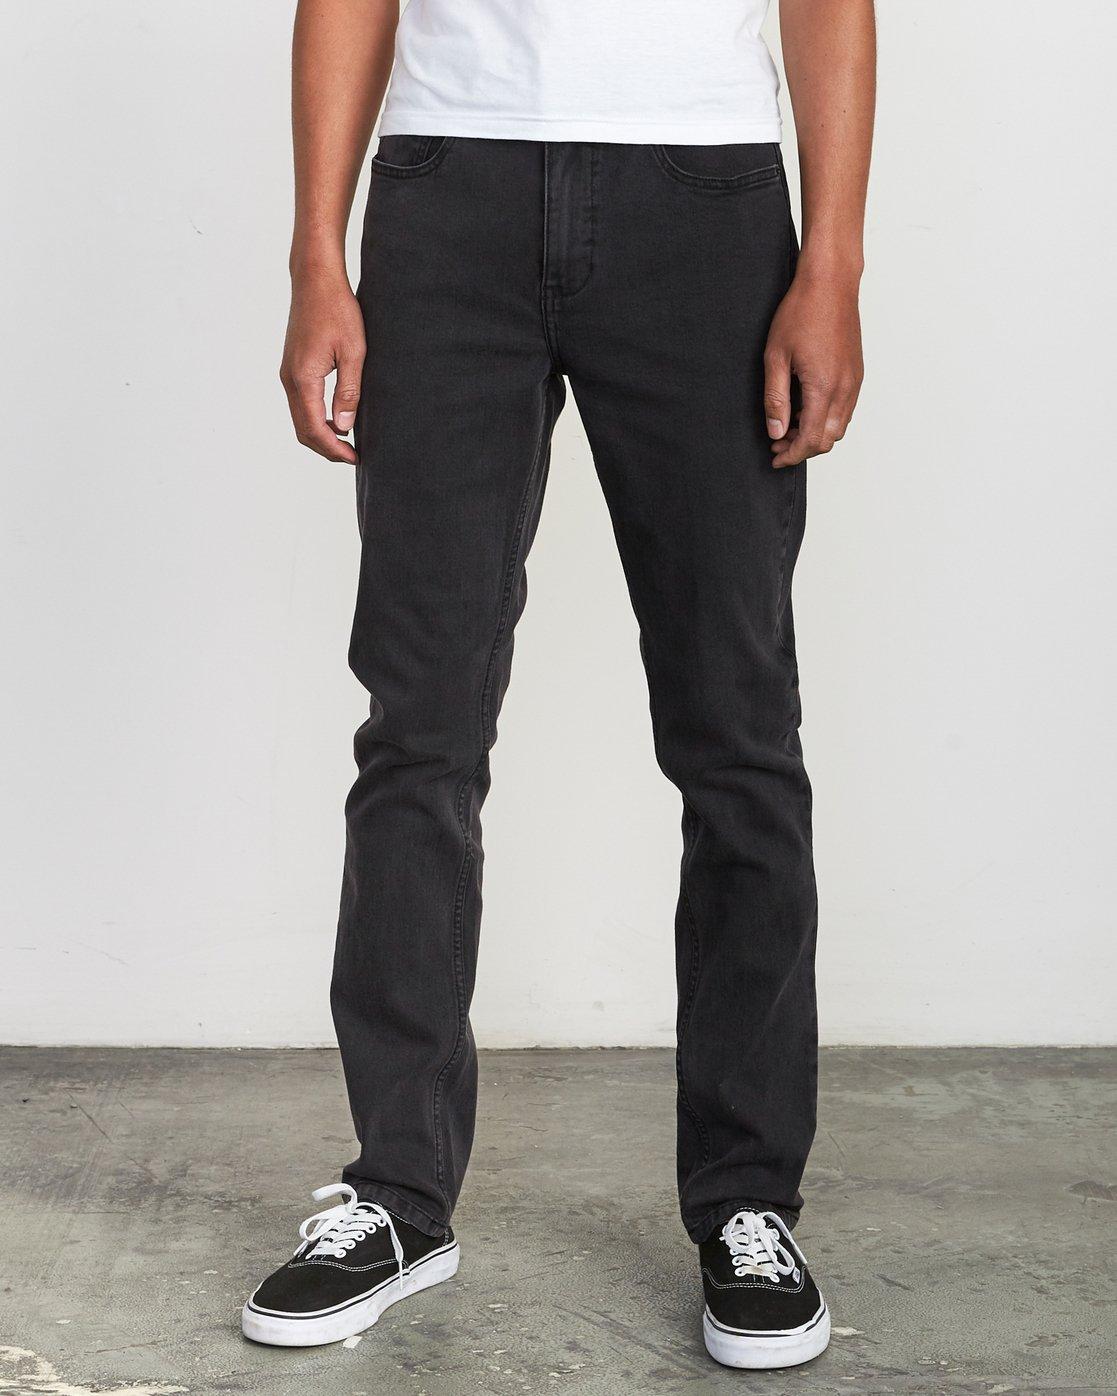 0 Hexed Denim - Jeans in Denim con Vestibilità Slim da Uomo Black Q1PNRCRVF9 RVCA